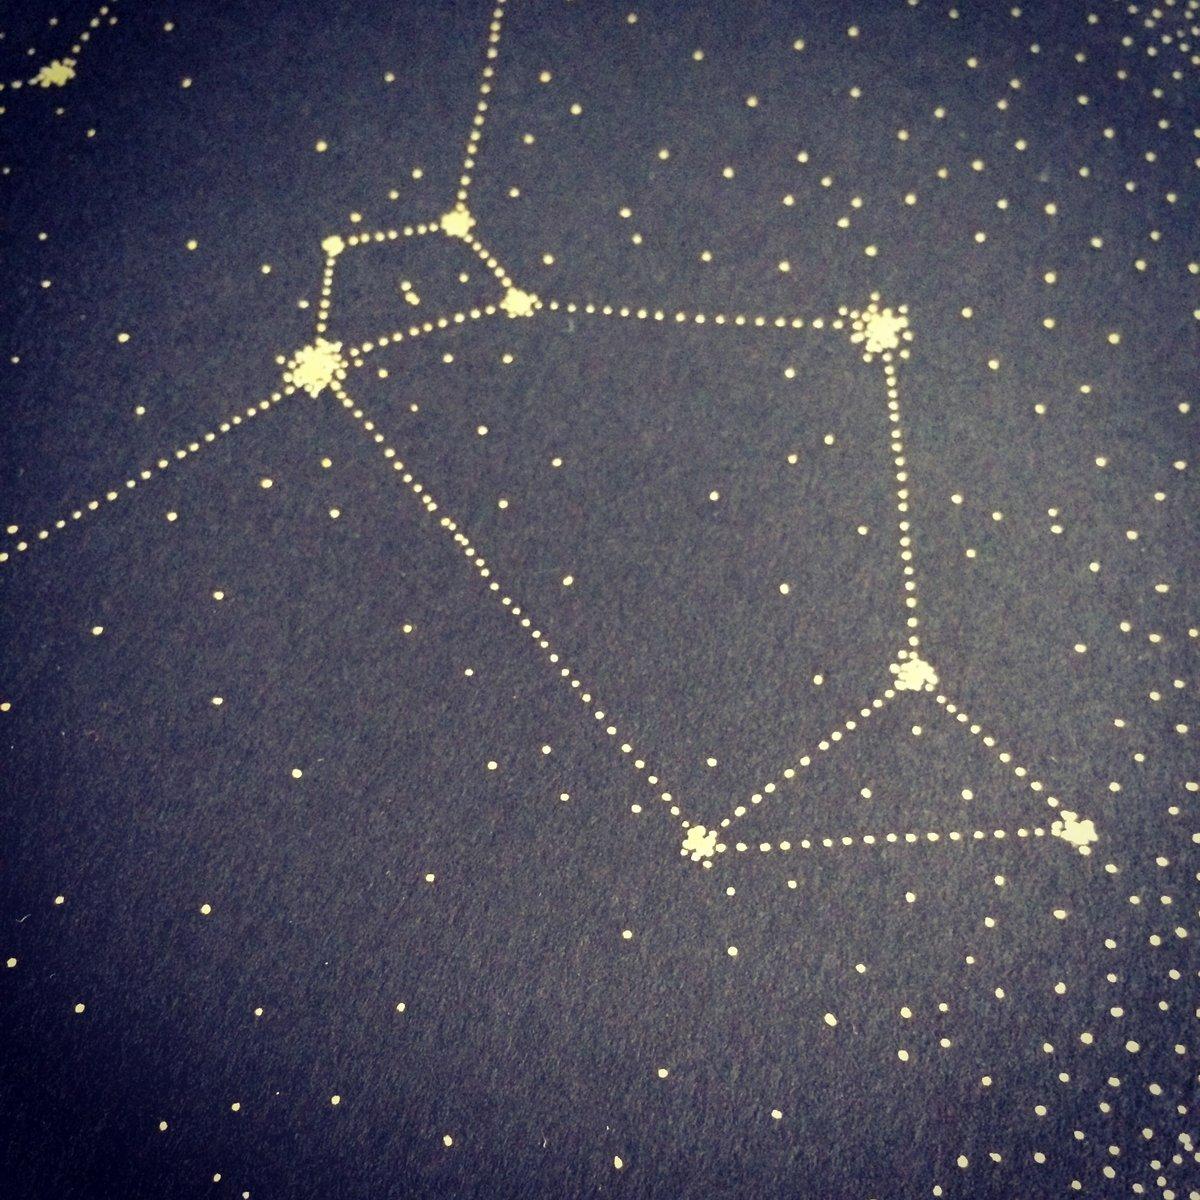 Cheapest Shipping Options >> Bespoke Star Constellation Drawing / Sabrina Kaïci Drawings